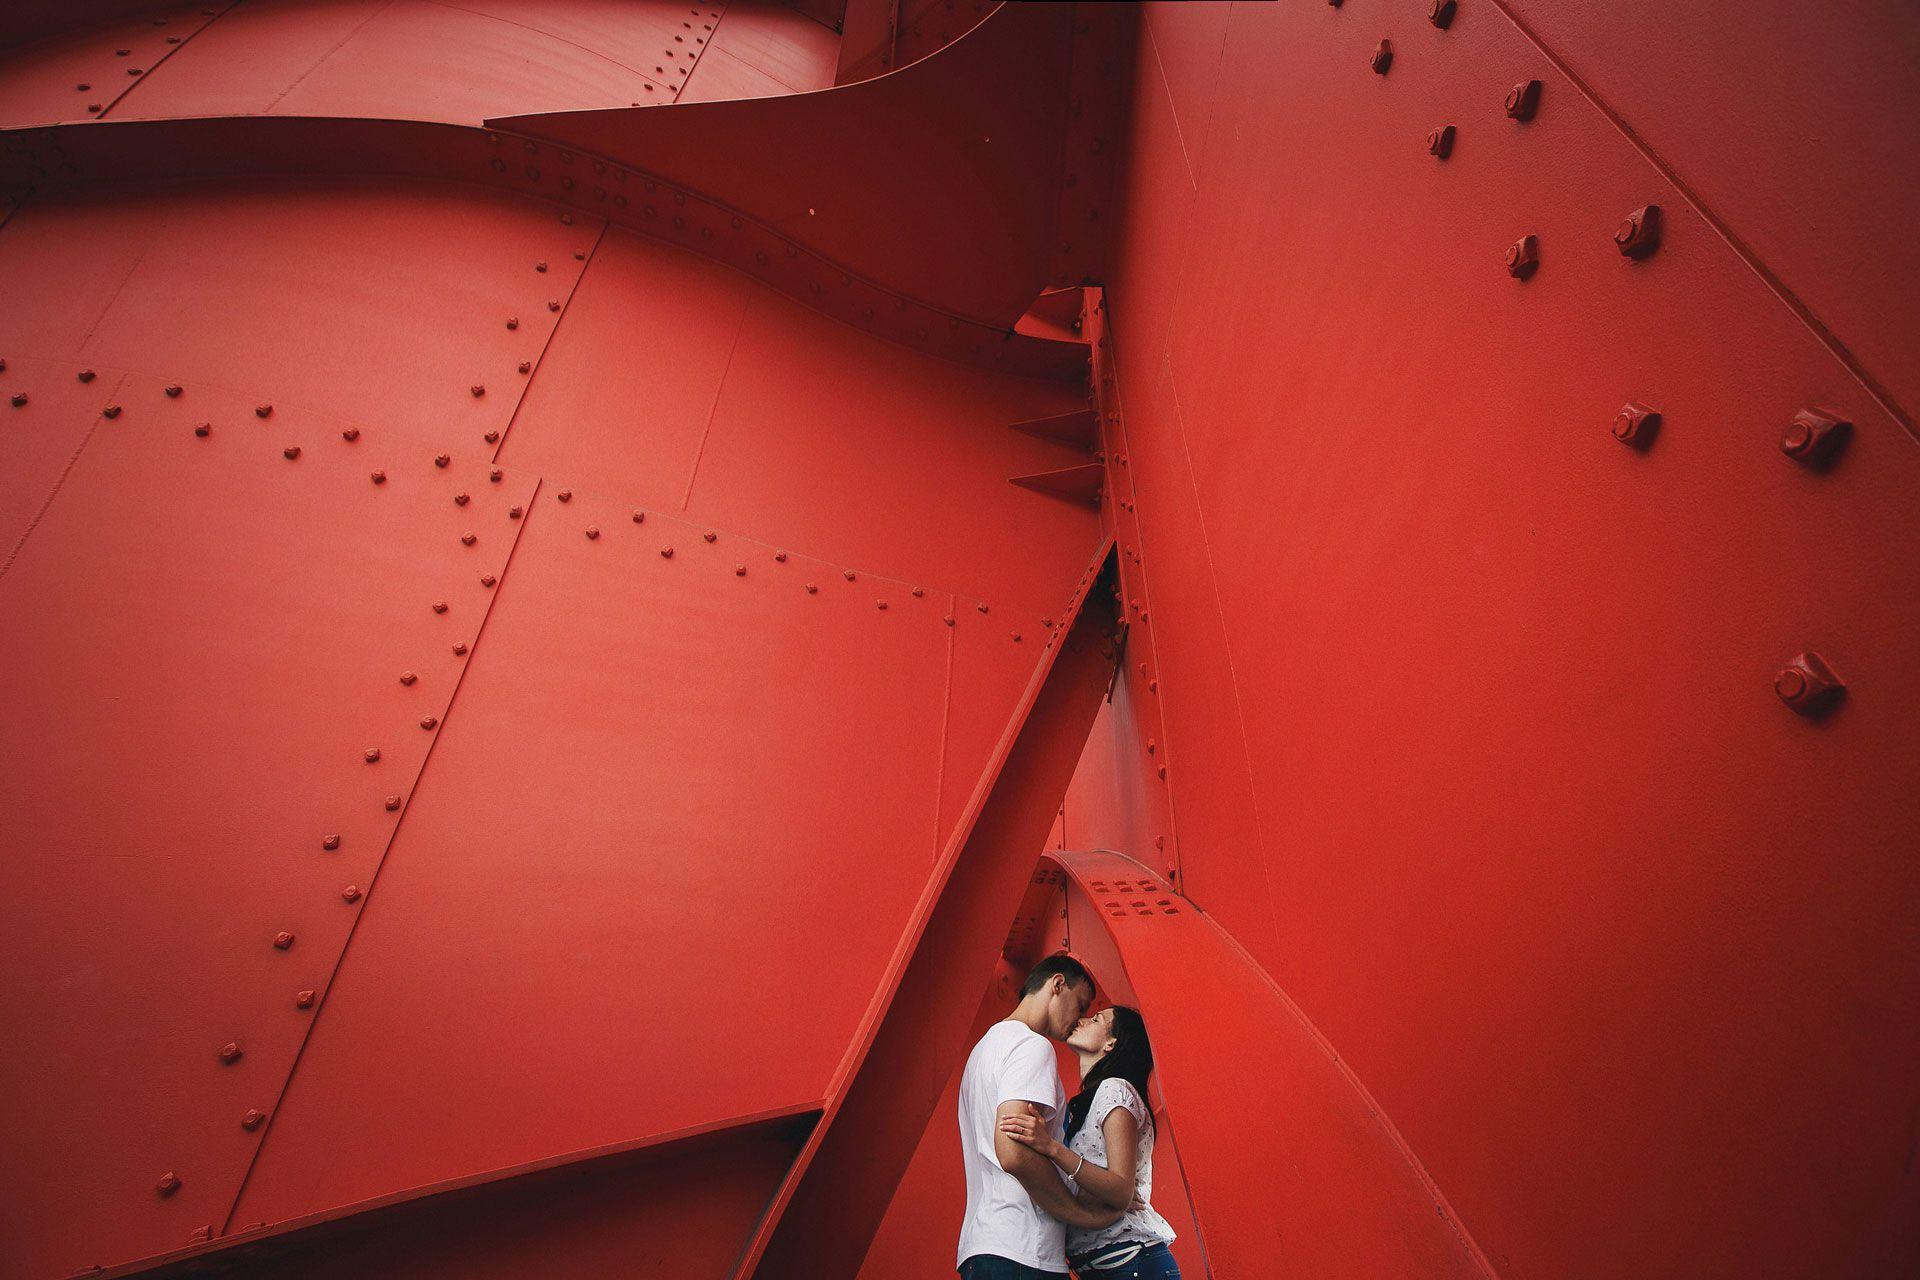 Фотографии Дмитрия Горбунова: минимализм и простота форм, фото 8